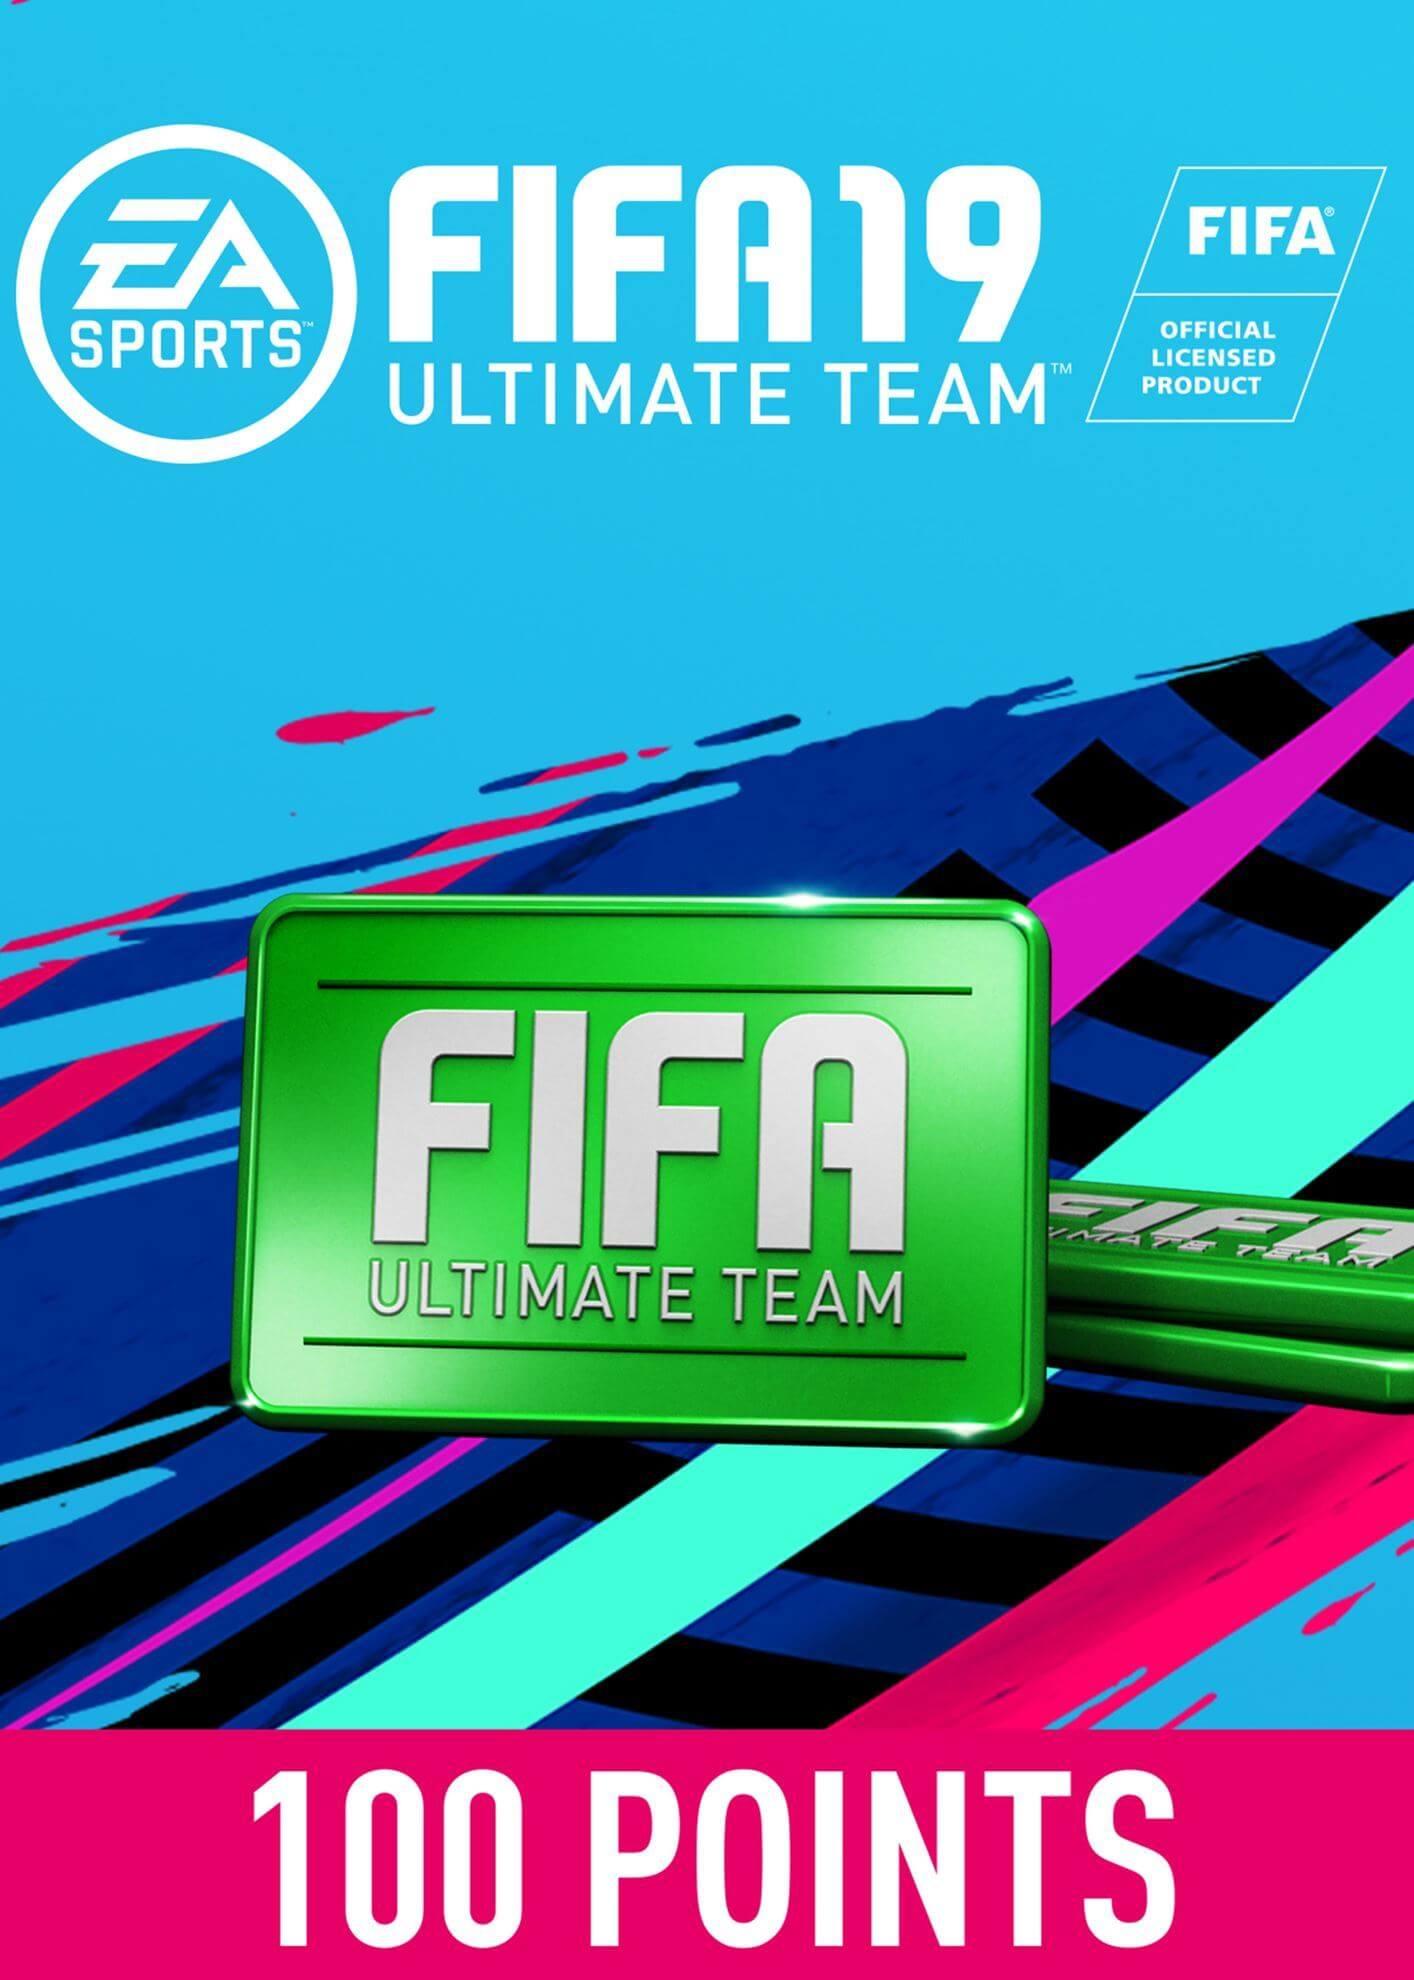 FIFA 19 ULTIMATE TEAM FIFA POINTS 100